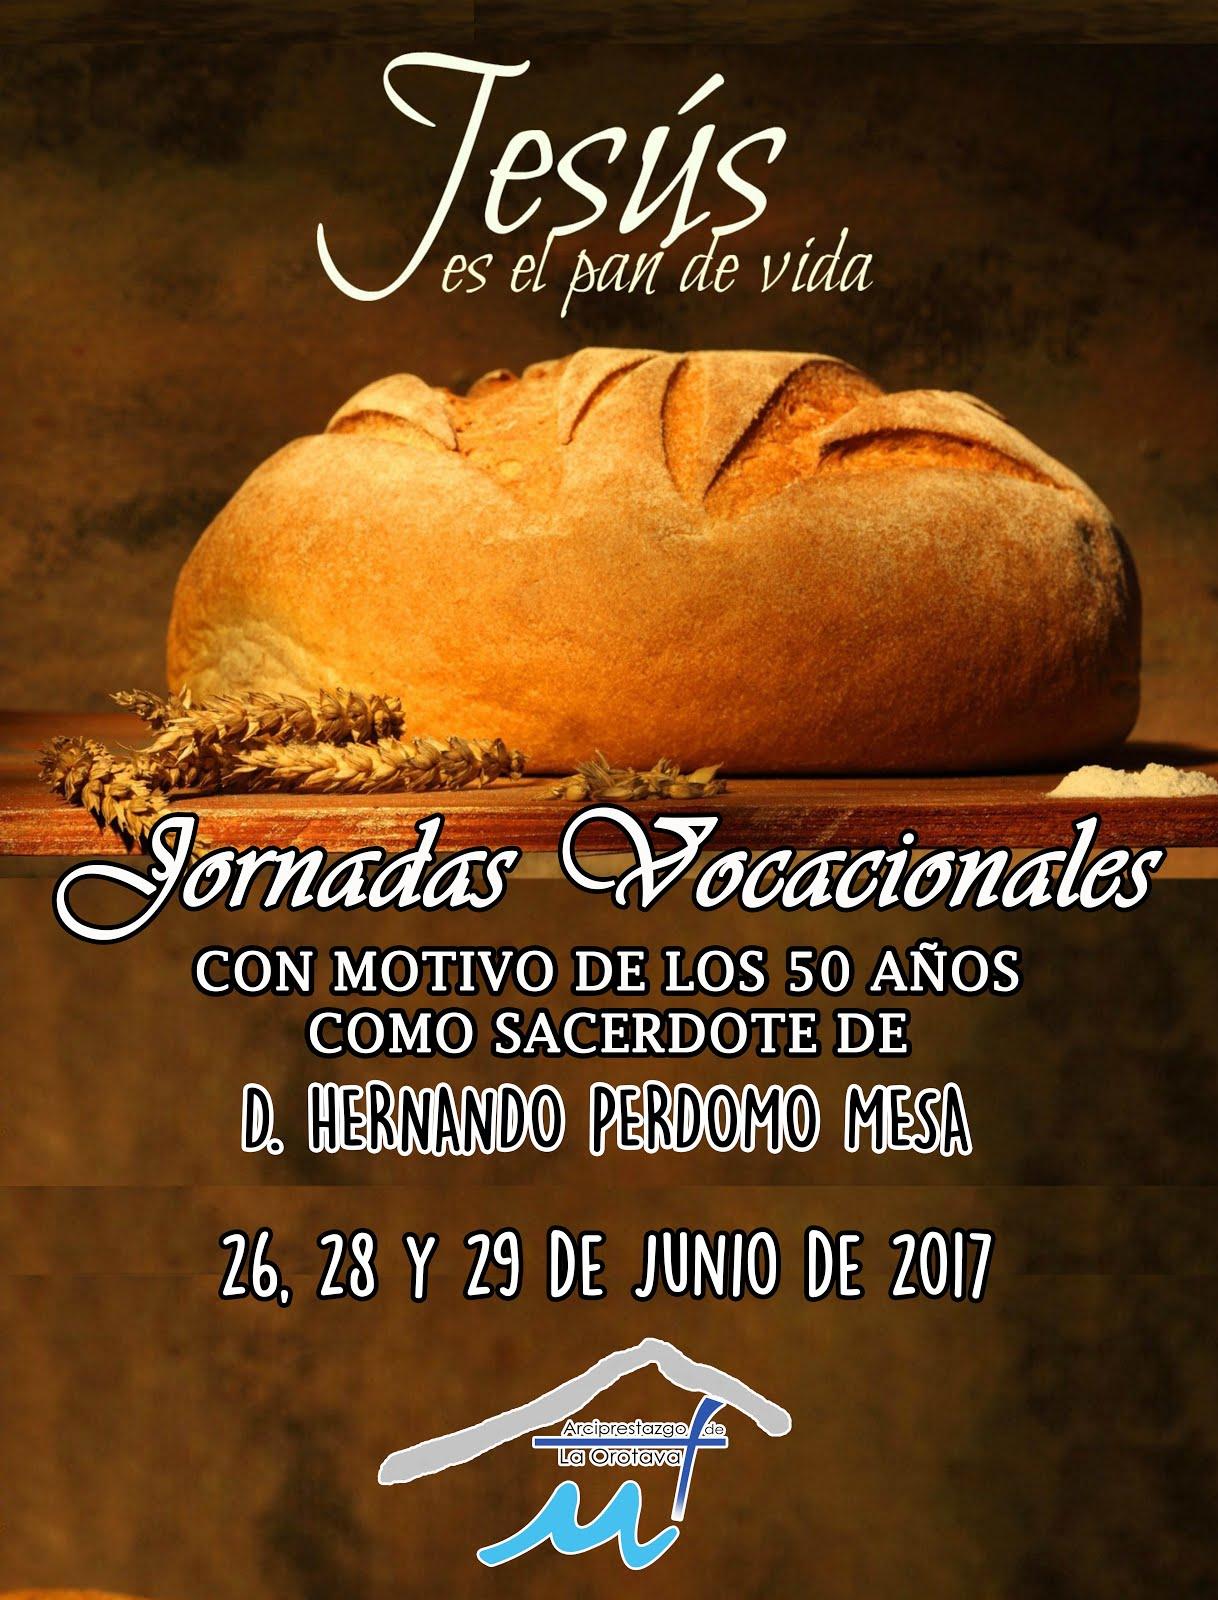 JORNADAS VOCACIONALES